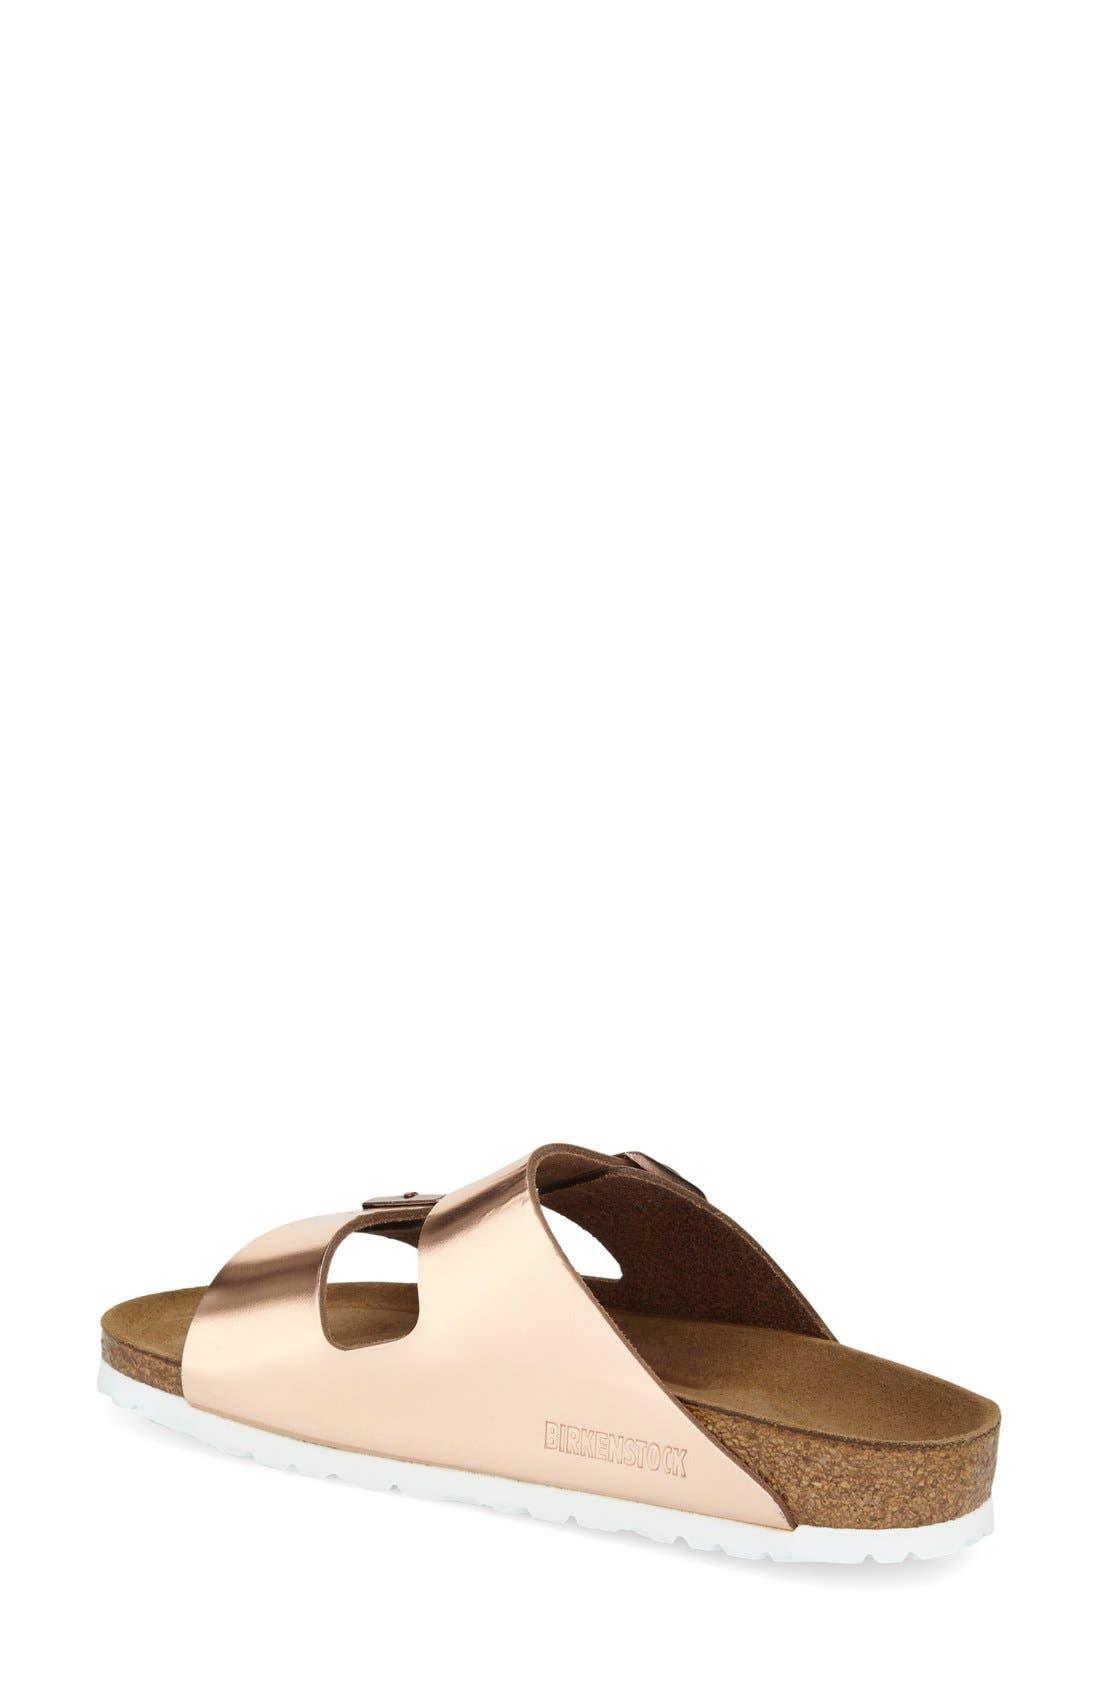 Arizona Soft Footbed Sandal,                             Alternate thumbnail 7, color,                             COPPER LEATHER